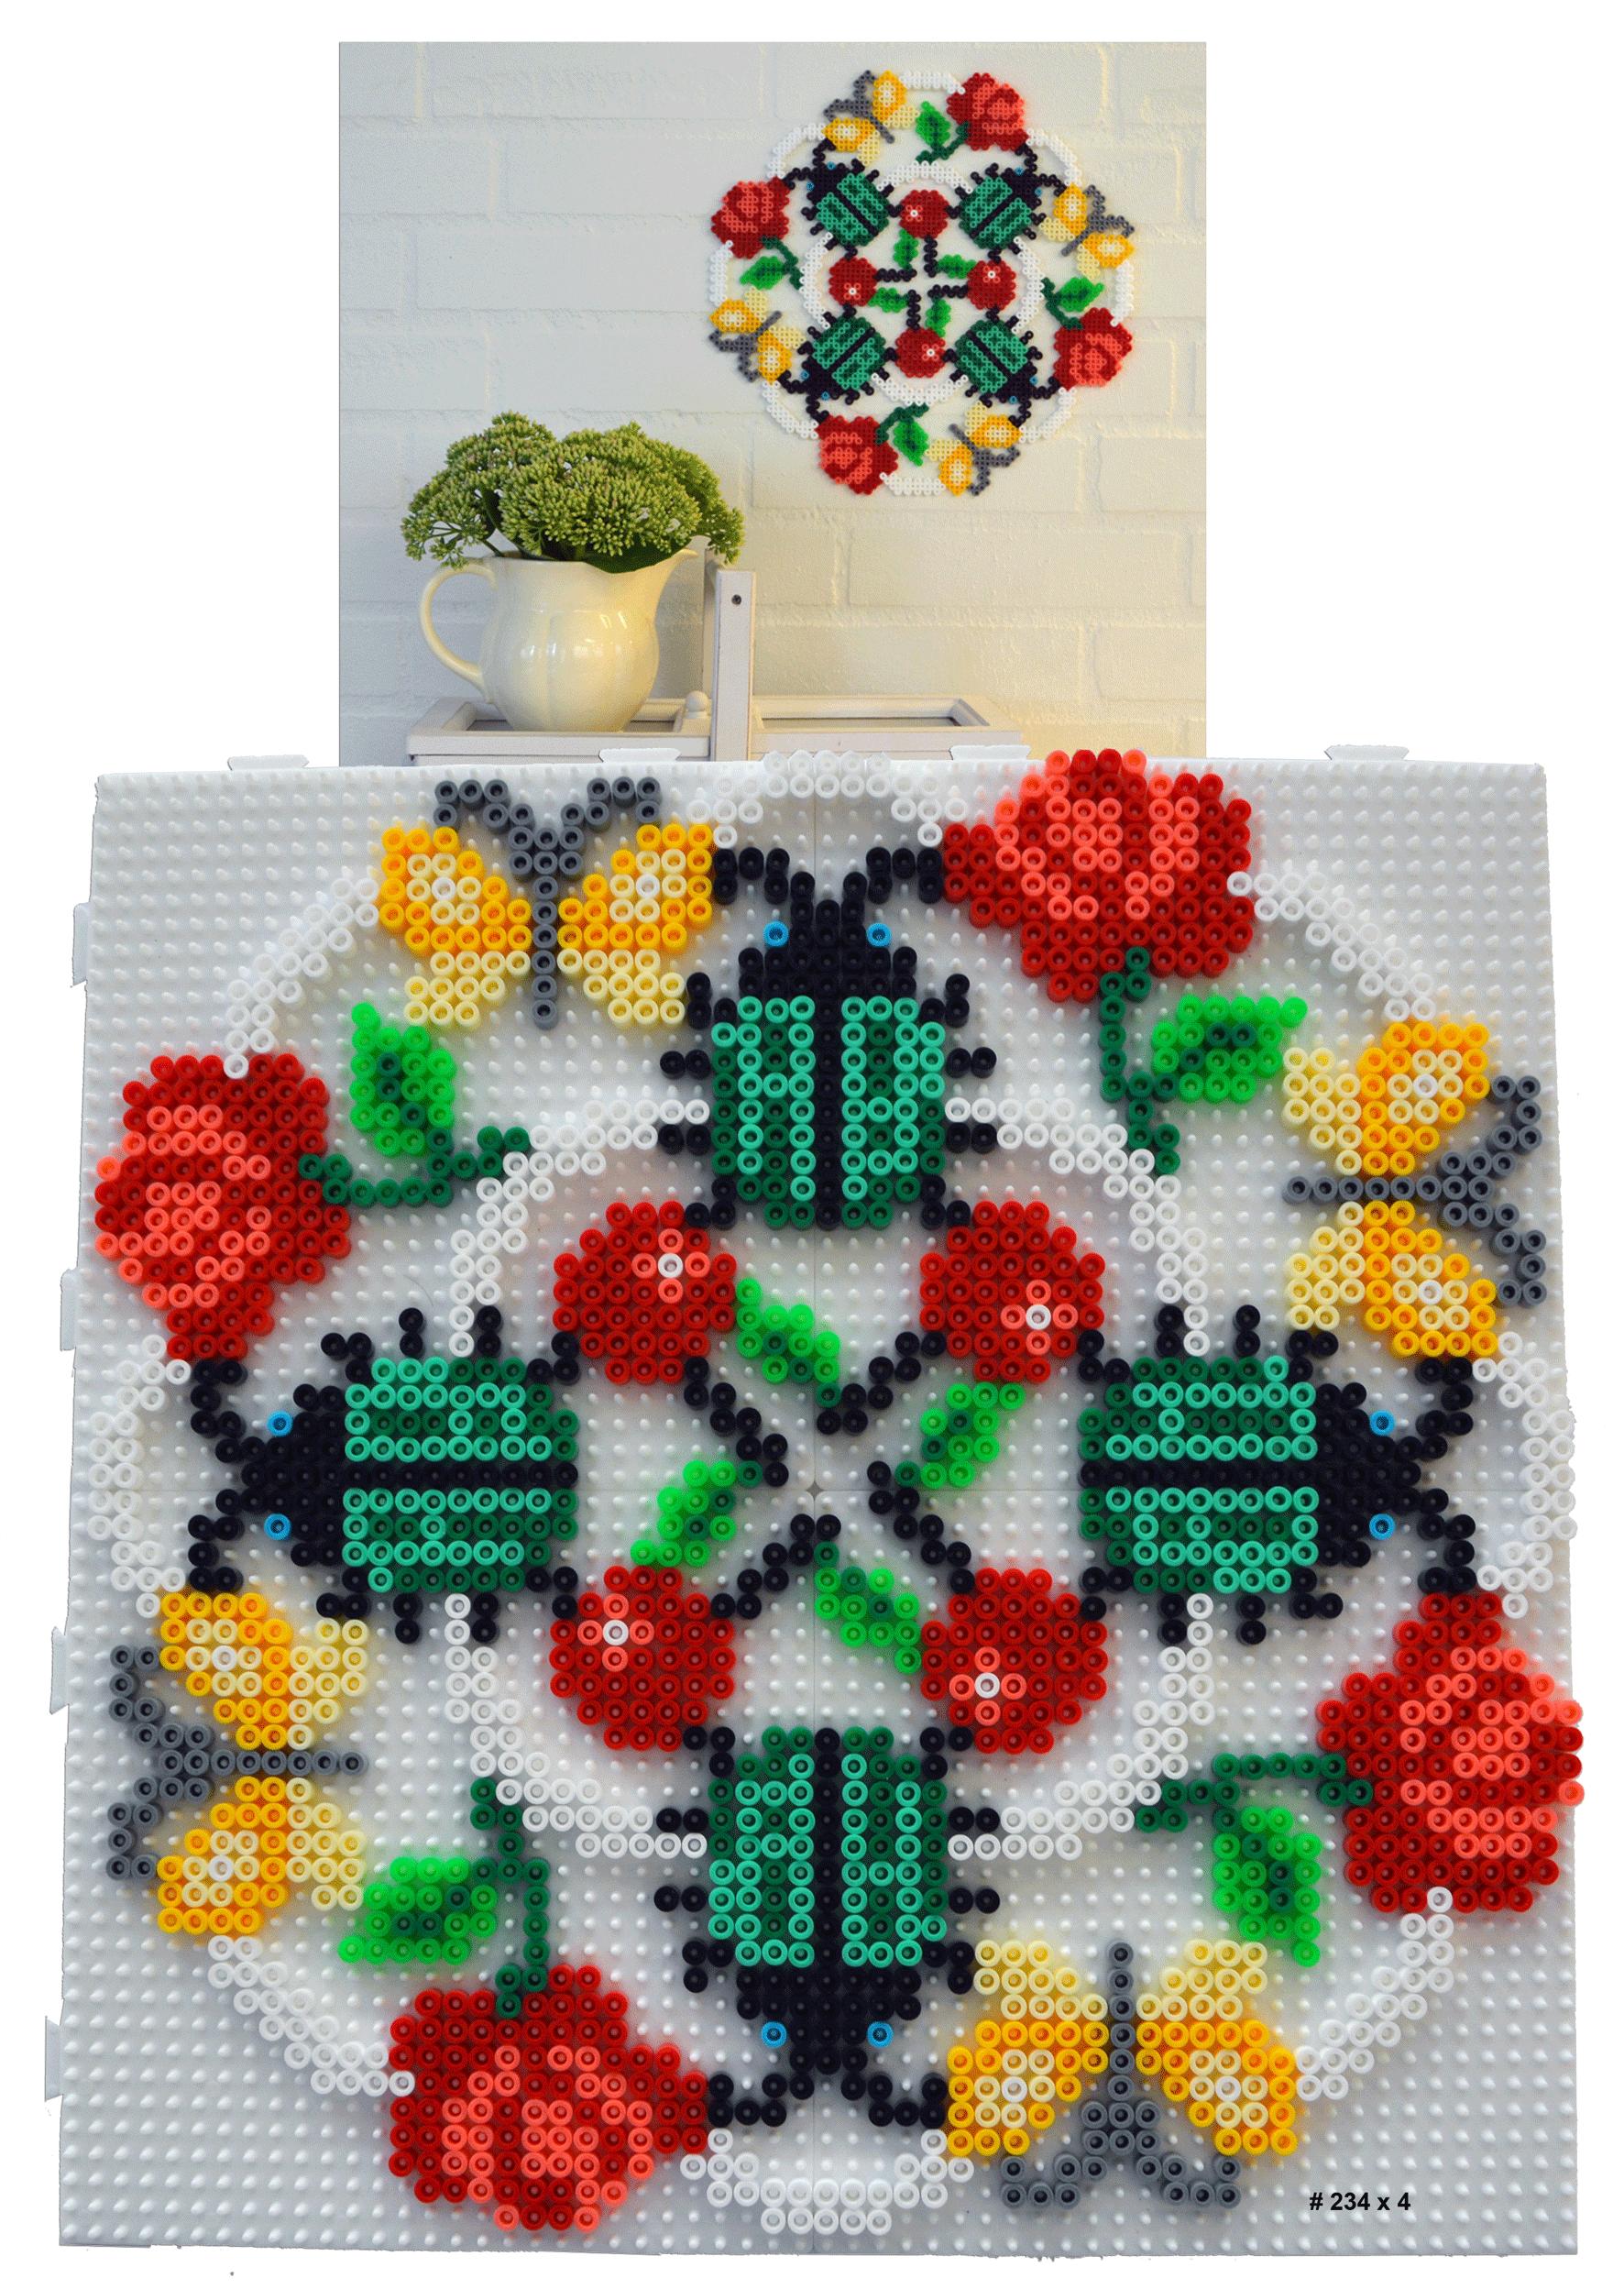 Summer-icon Hama Perler Beads - Hama.dk